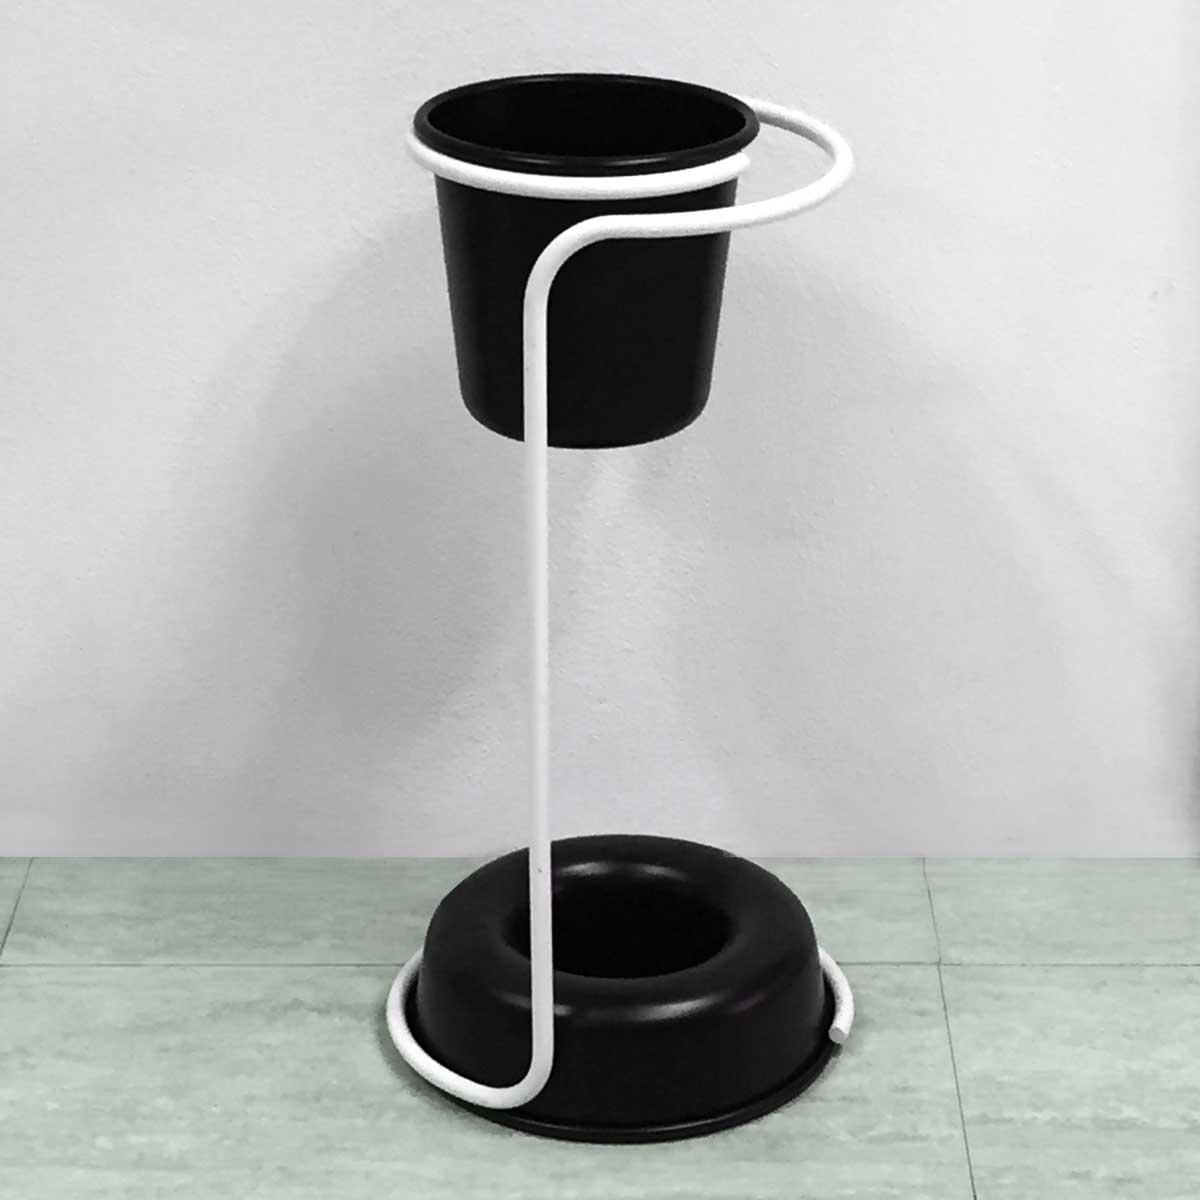 Francesco-Ruffa_Officinanove_Boa_umbrellastand_design_2